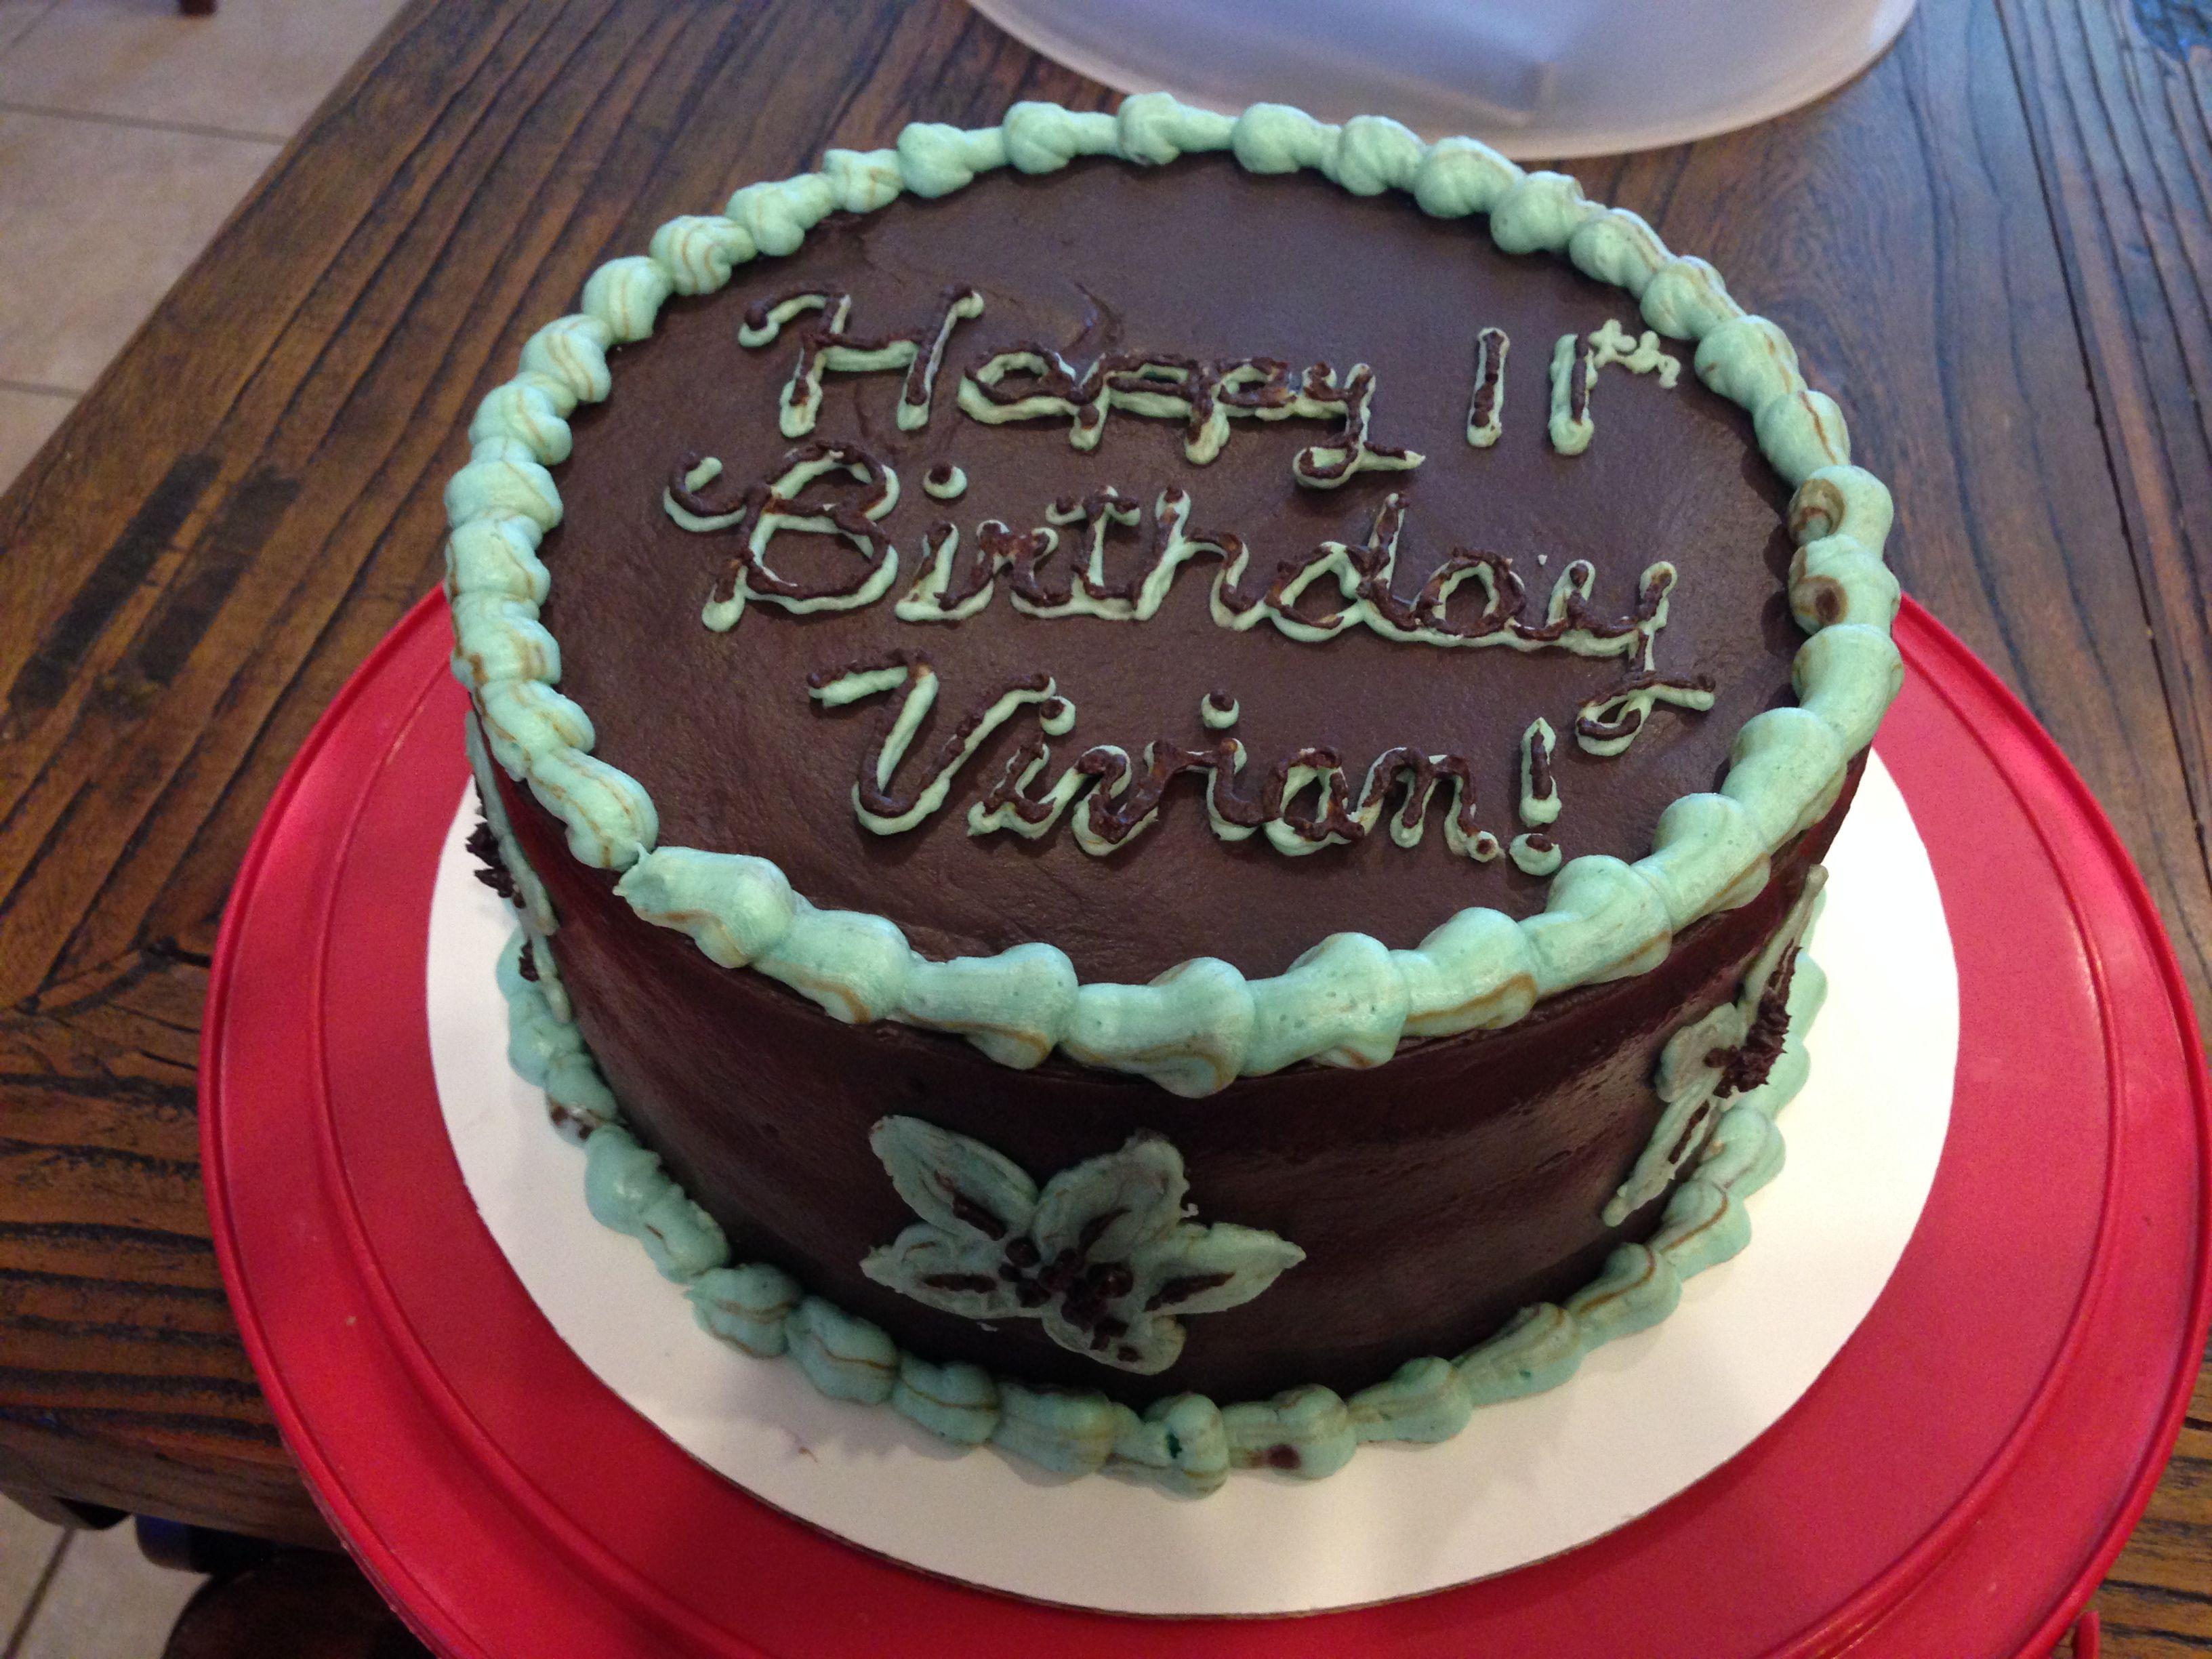 Happy birthday vivian cake